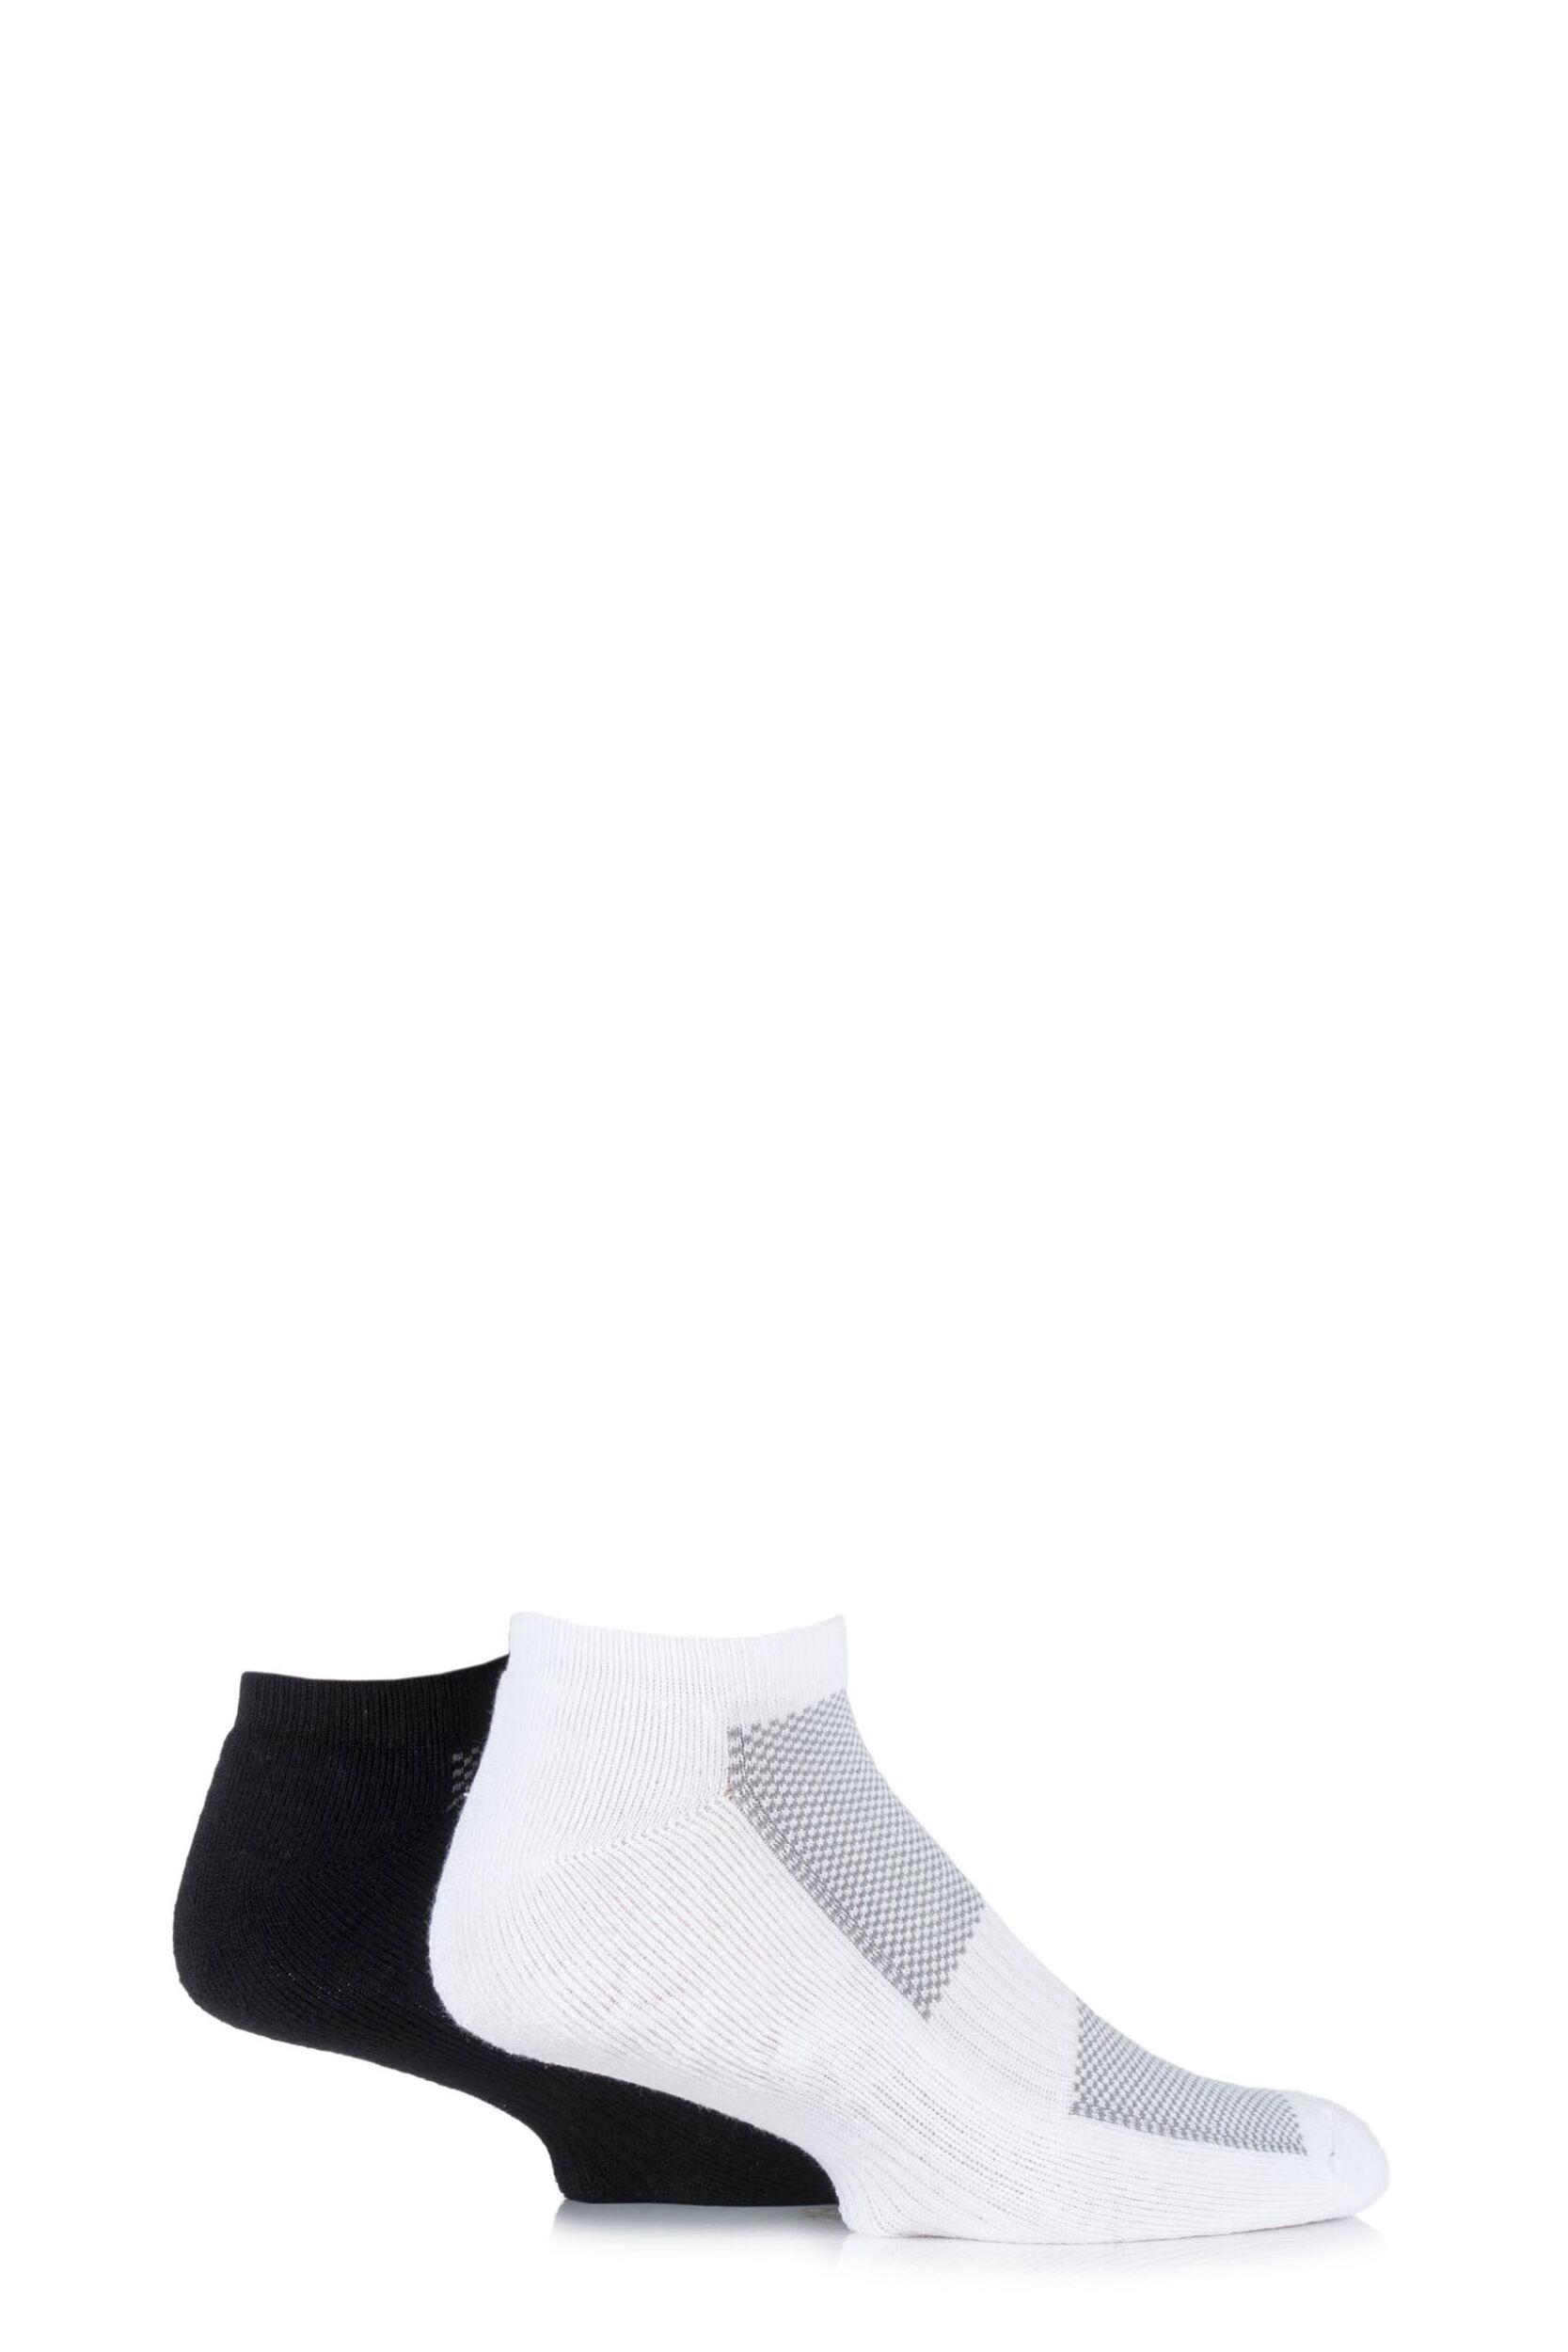 Mens 2 Pair HJ Hall Bamboo Cushioned Trainer Socks